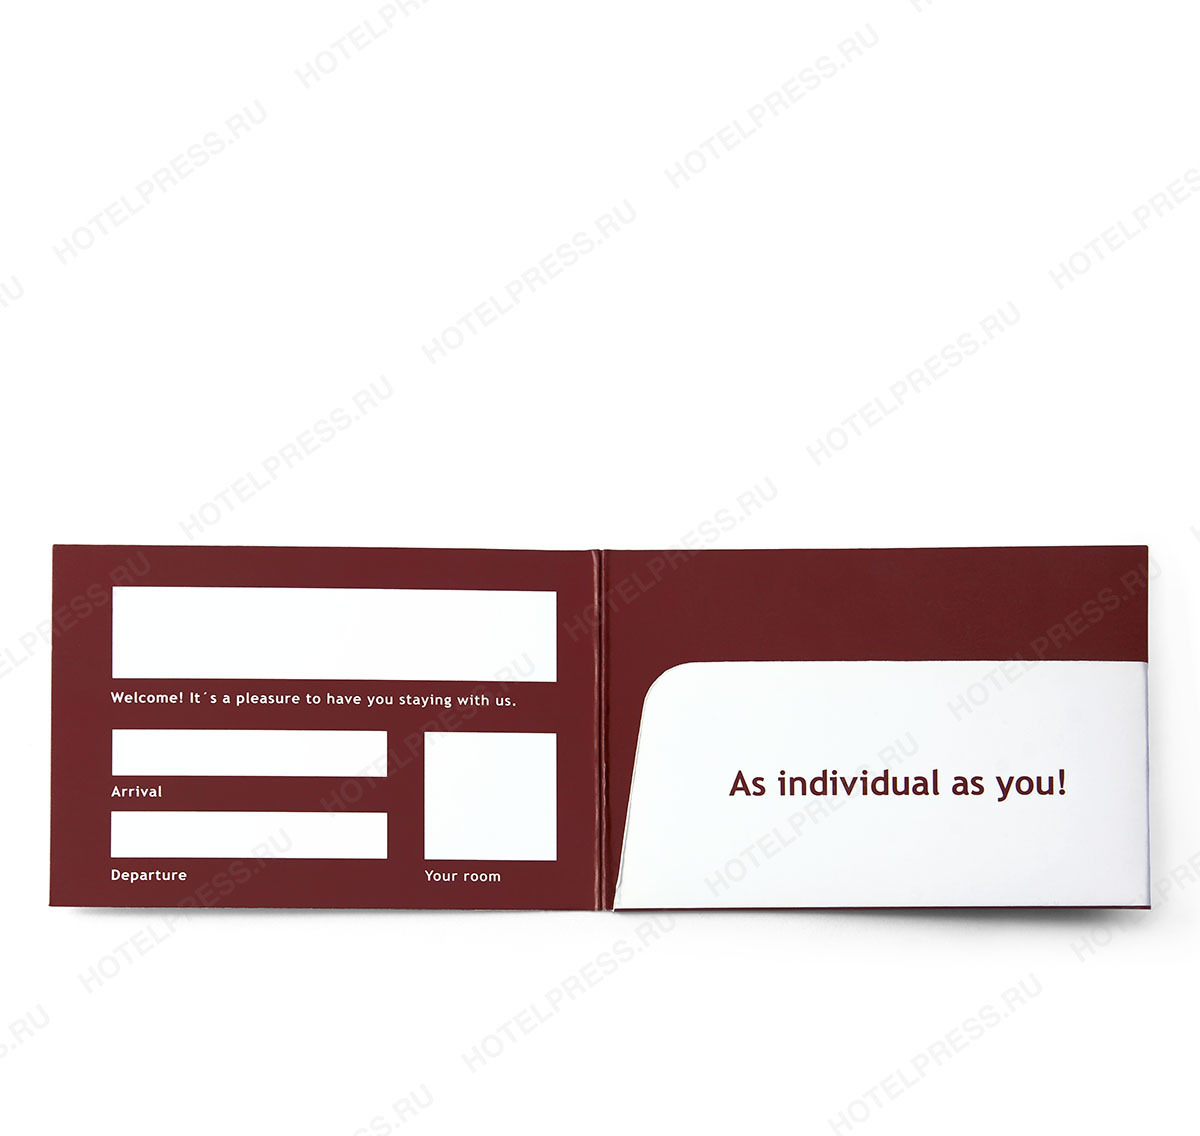 Картхолдер 93х63 мм под пластиковую карту или ключ карту